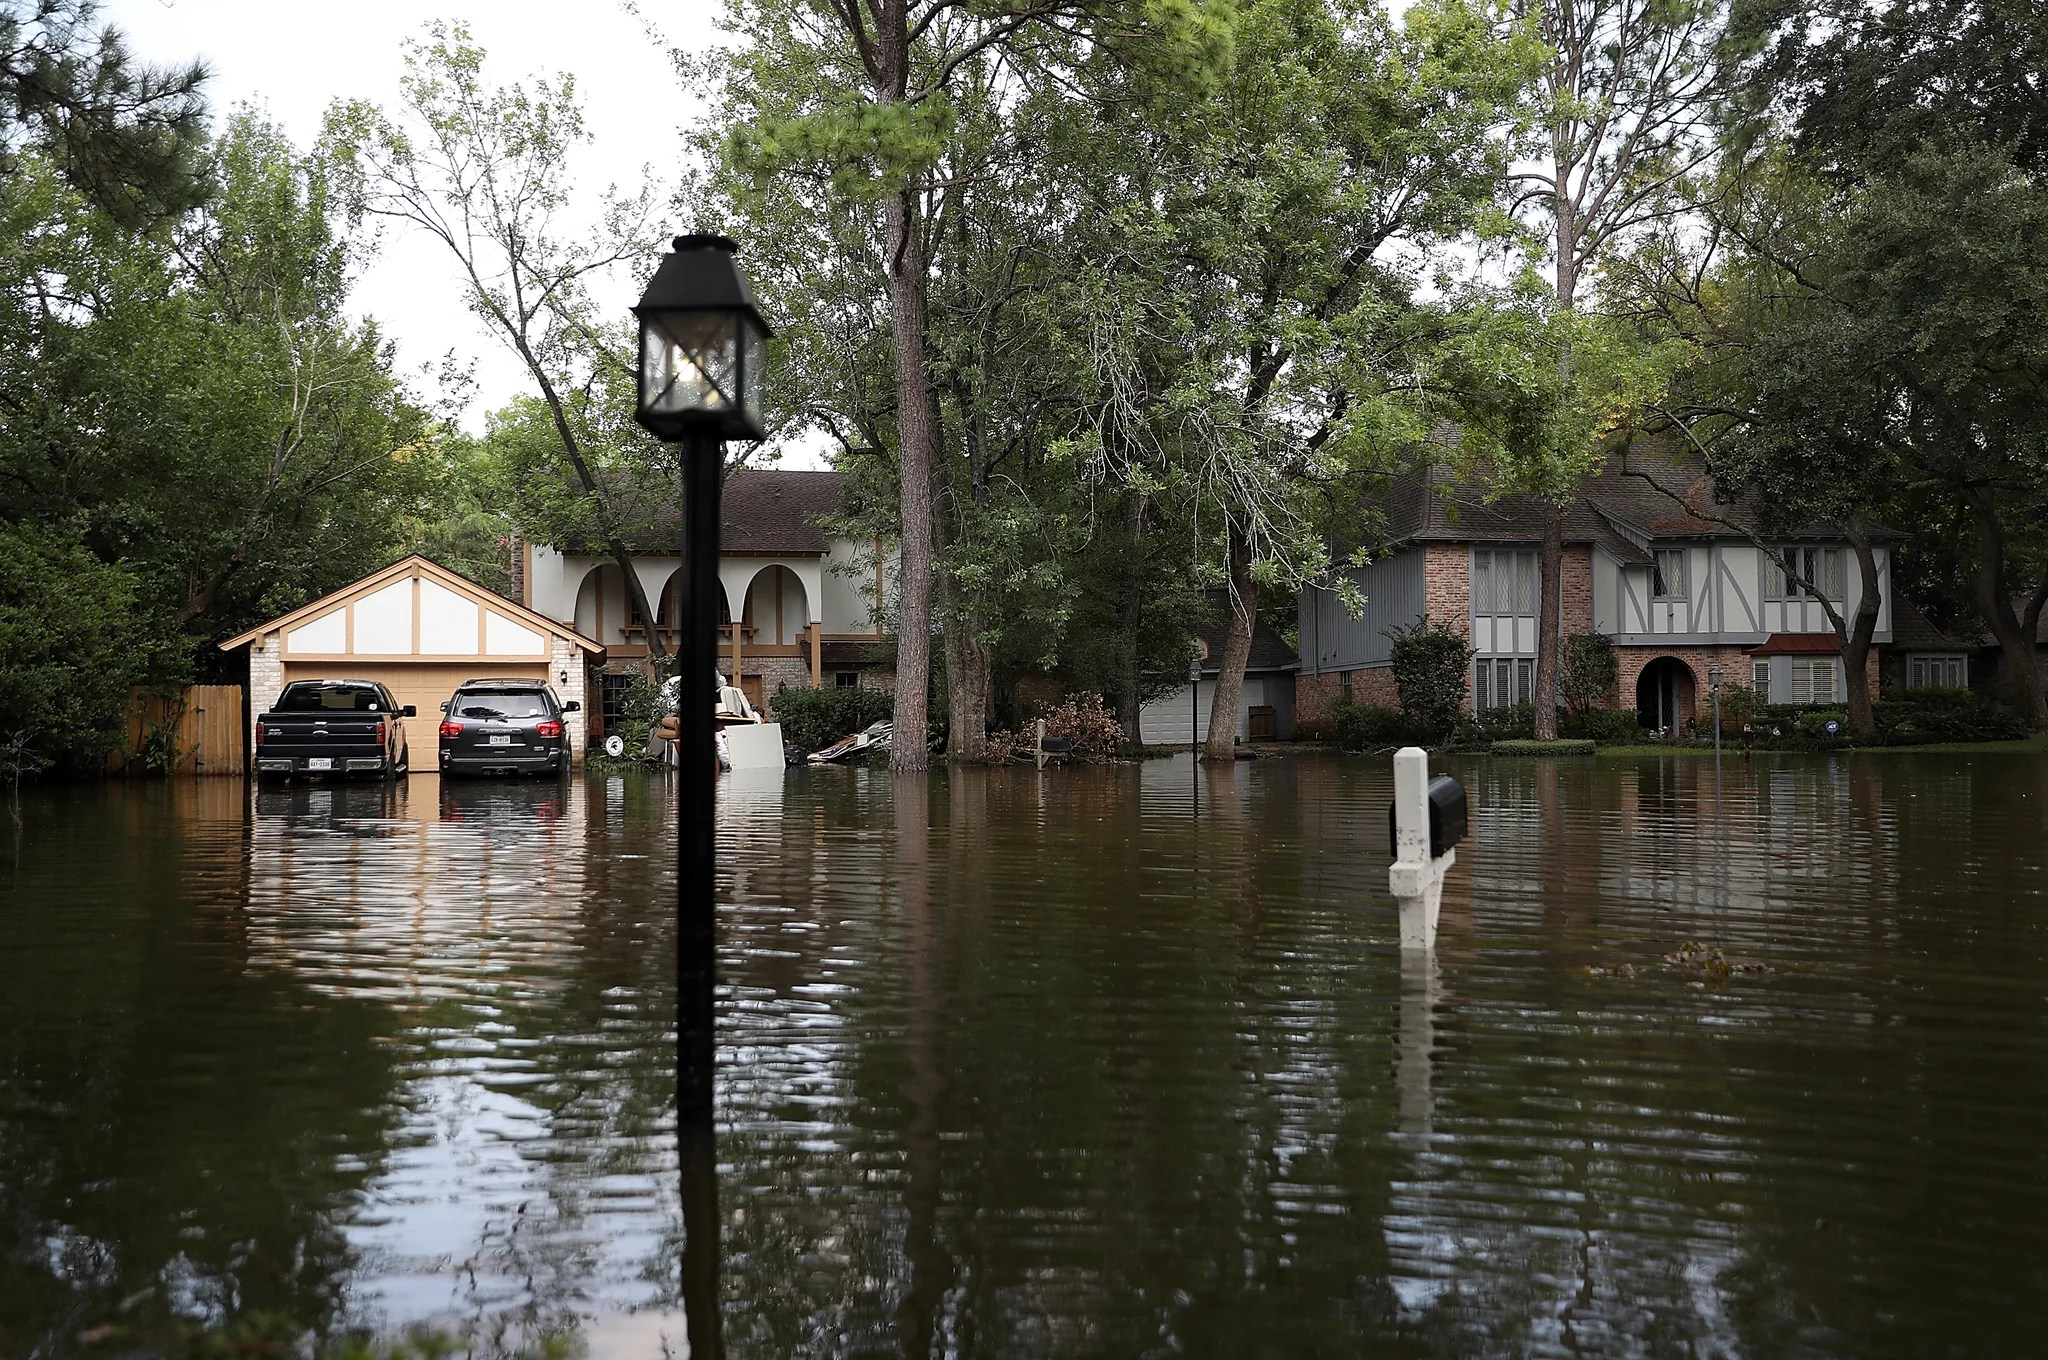 Personal Essay On Hurricane Harvey In Houston Tx